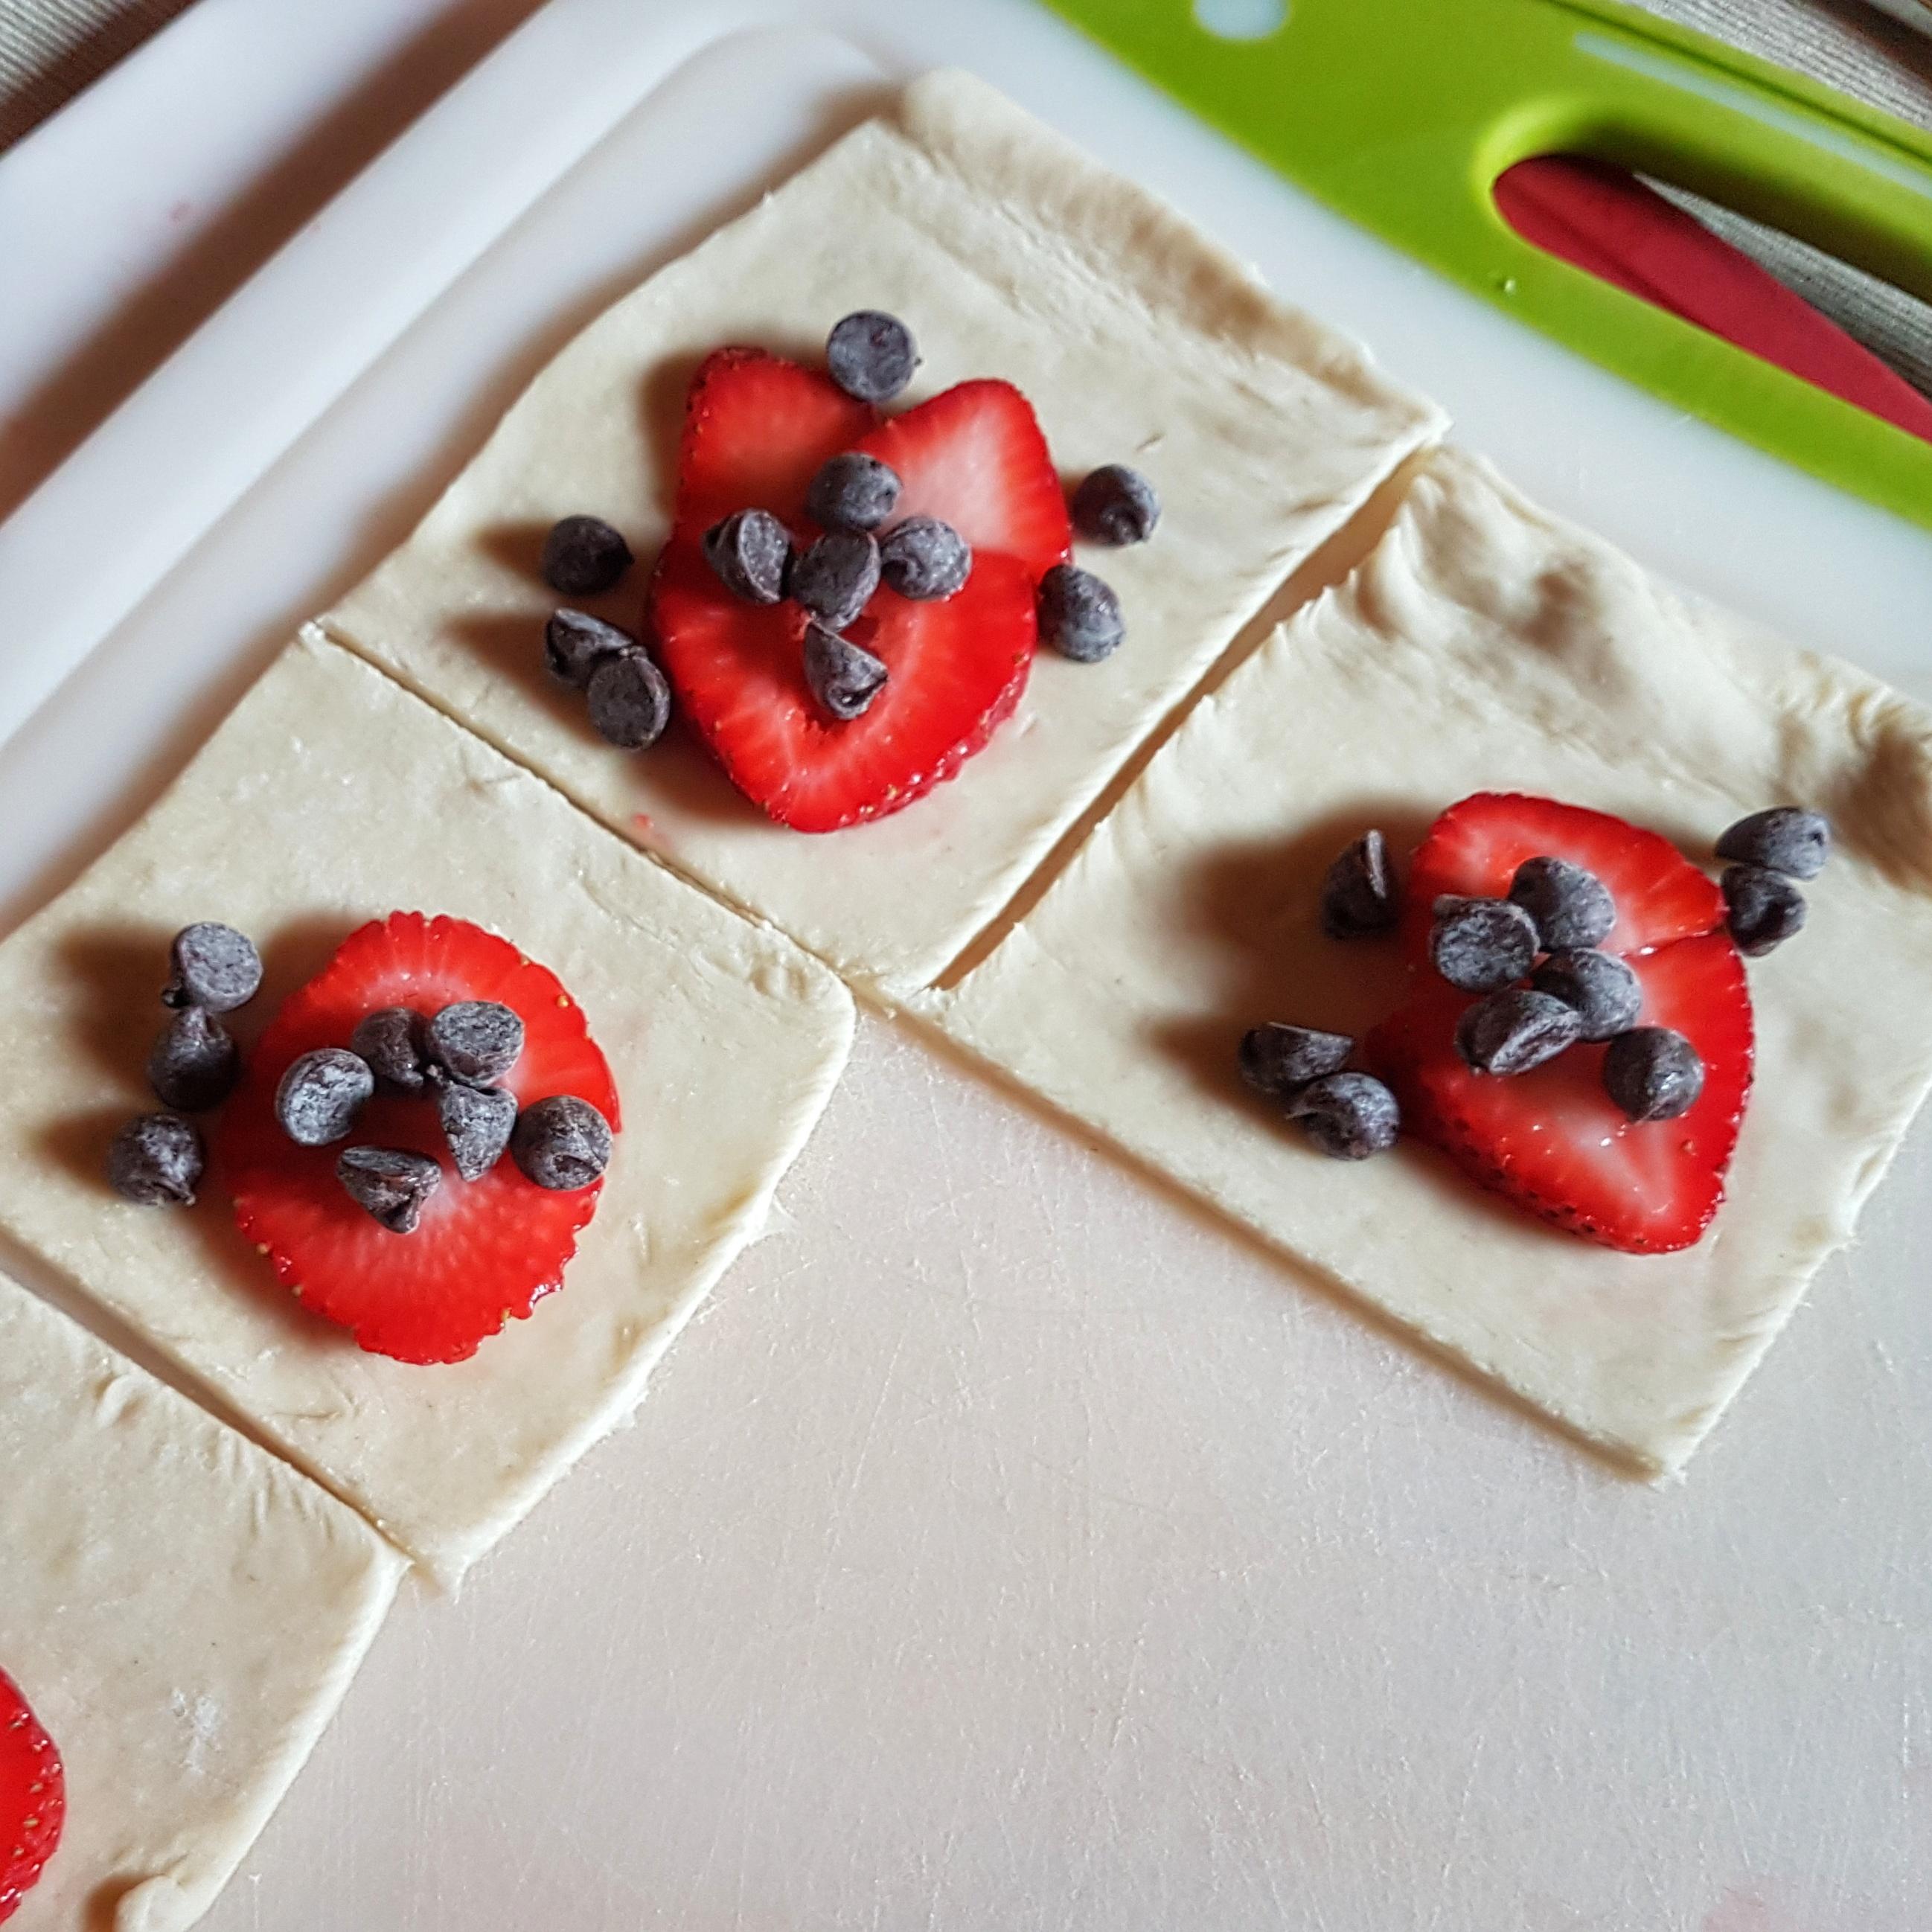 strawberry chocolate pastry prebake